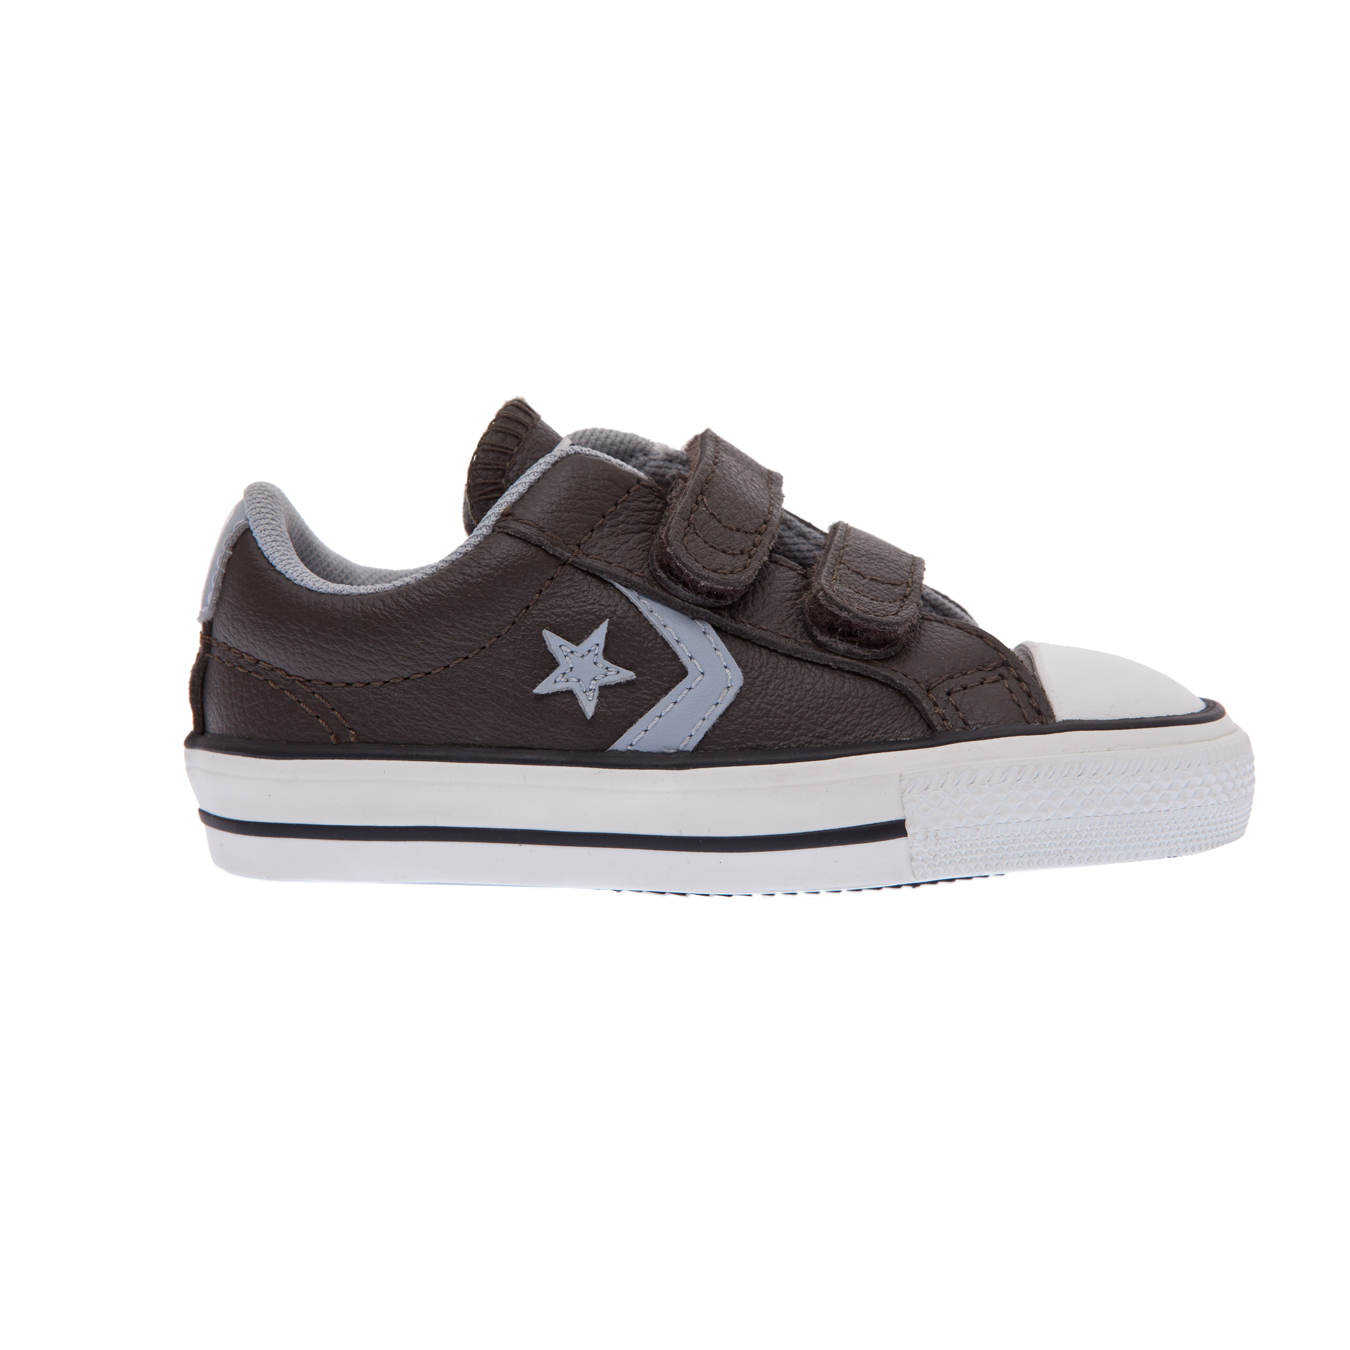 CONVERSE – Βρεφικά παπούτσια Converse Star Player EV 2V γκρι